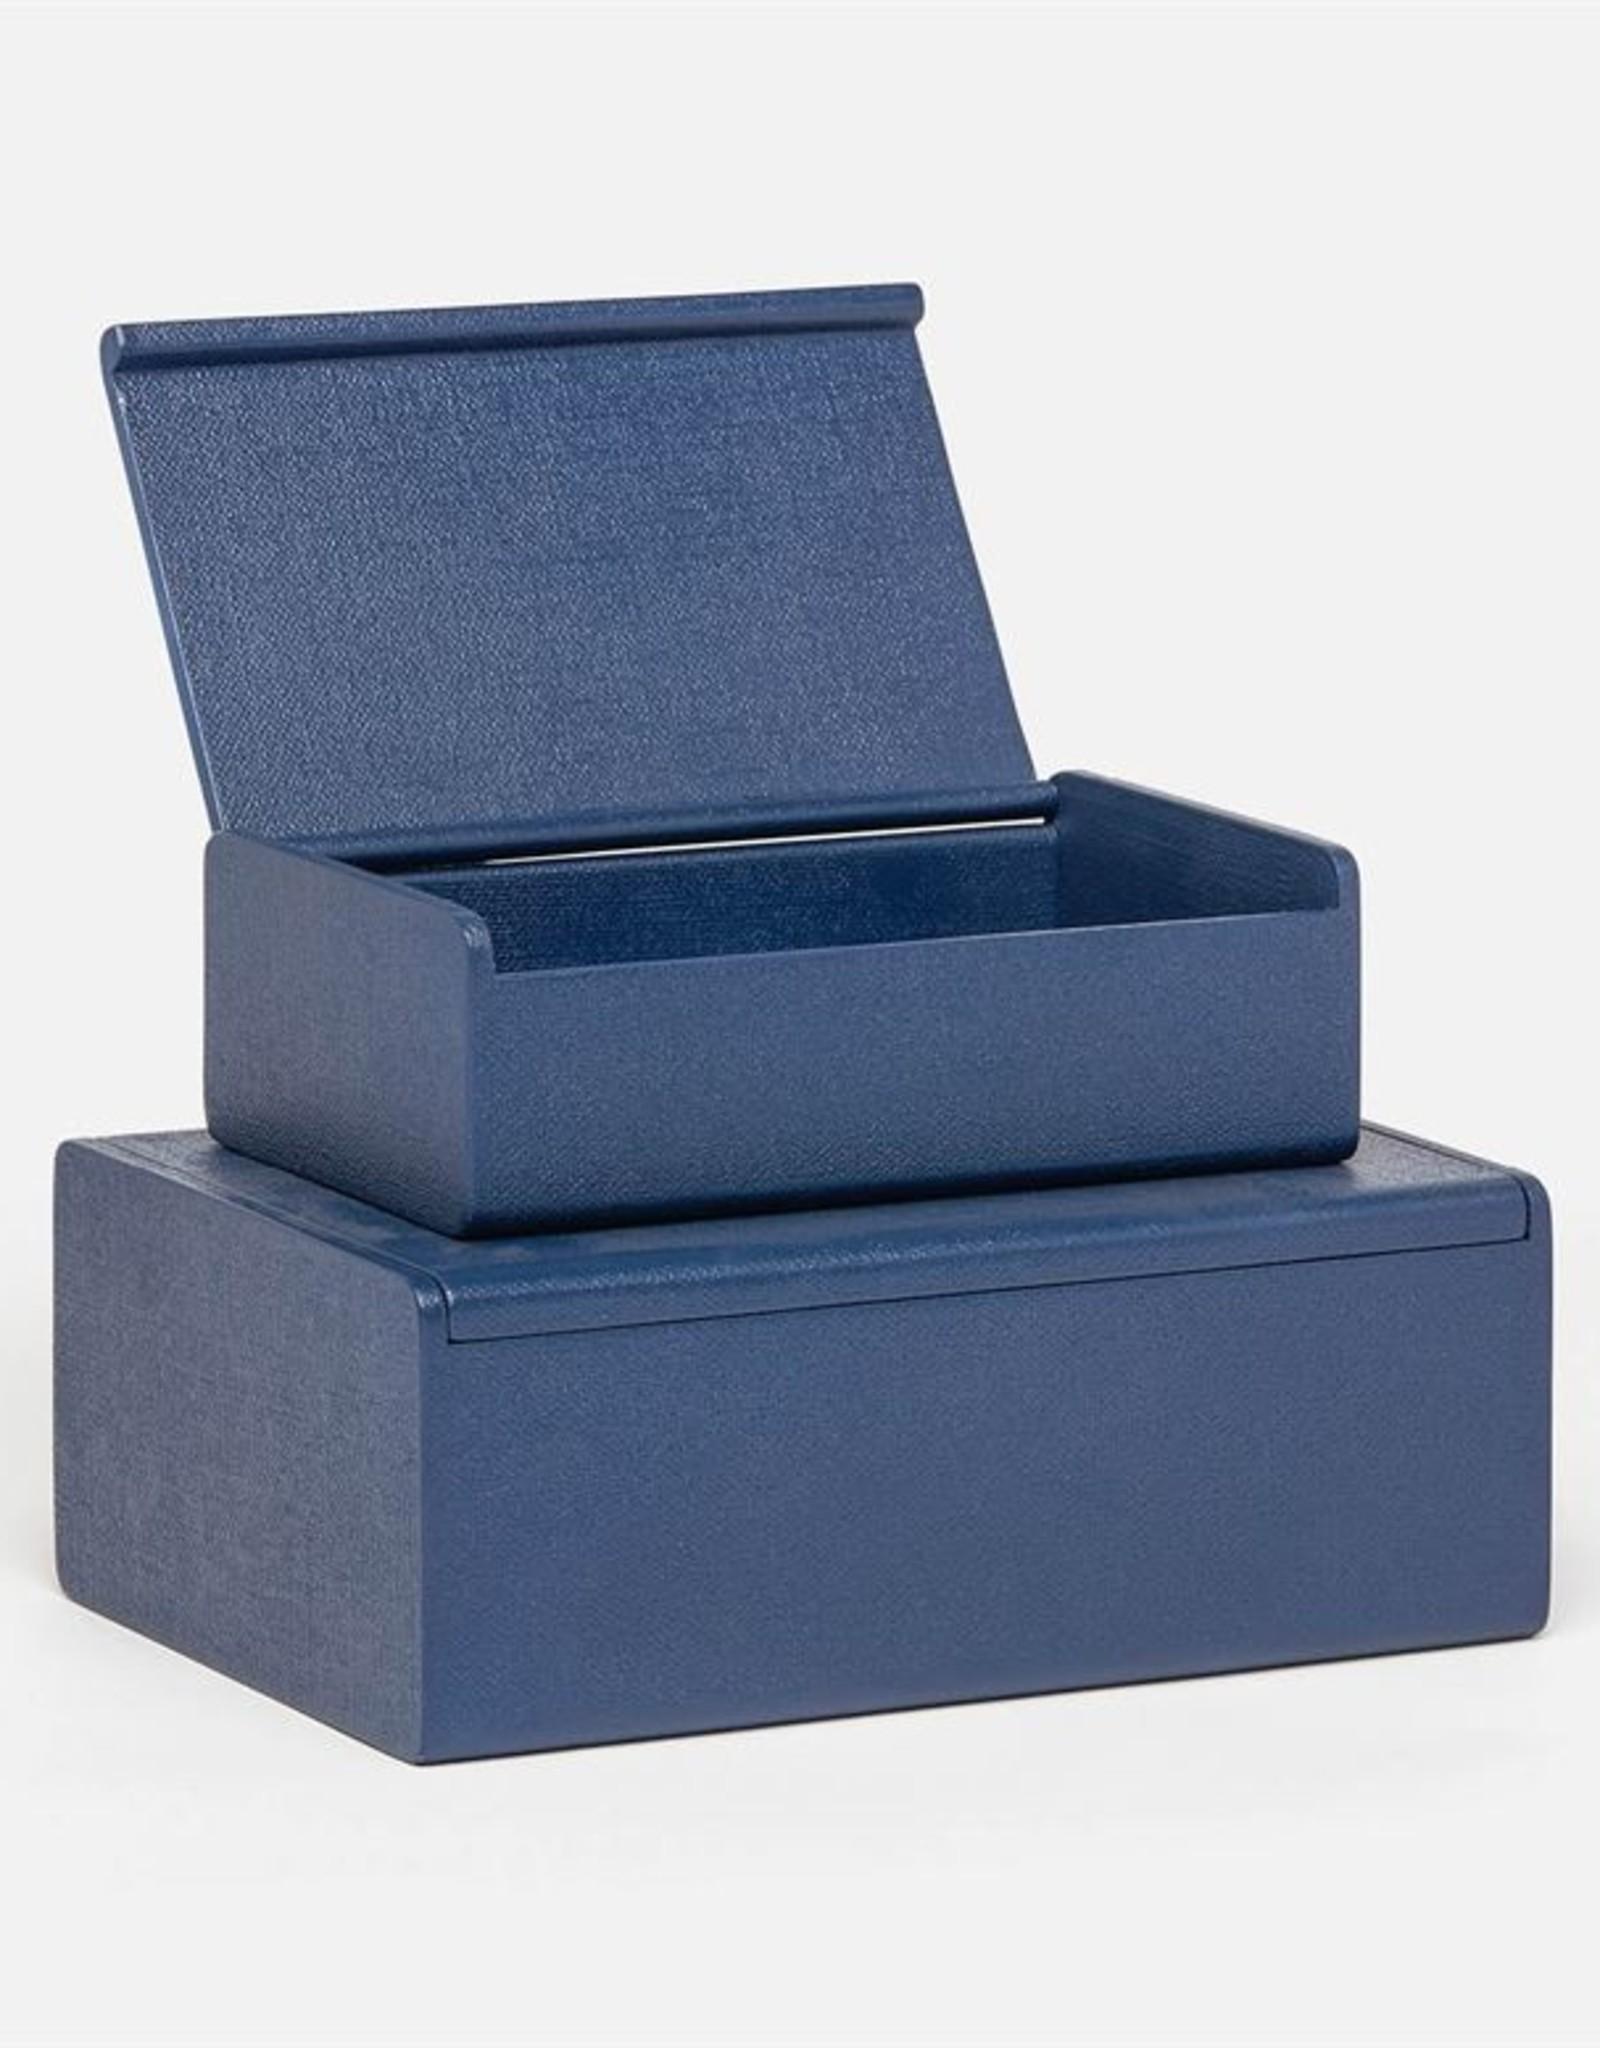 Made Goods Halia Box